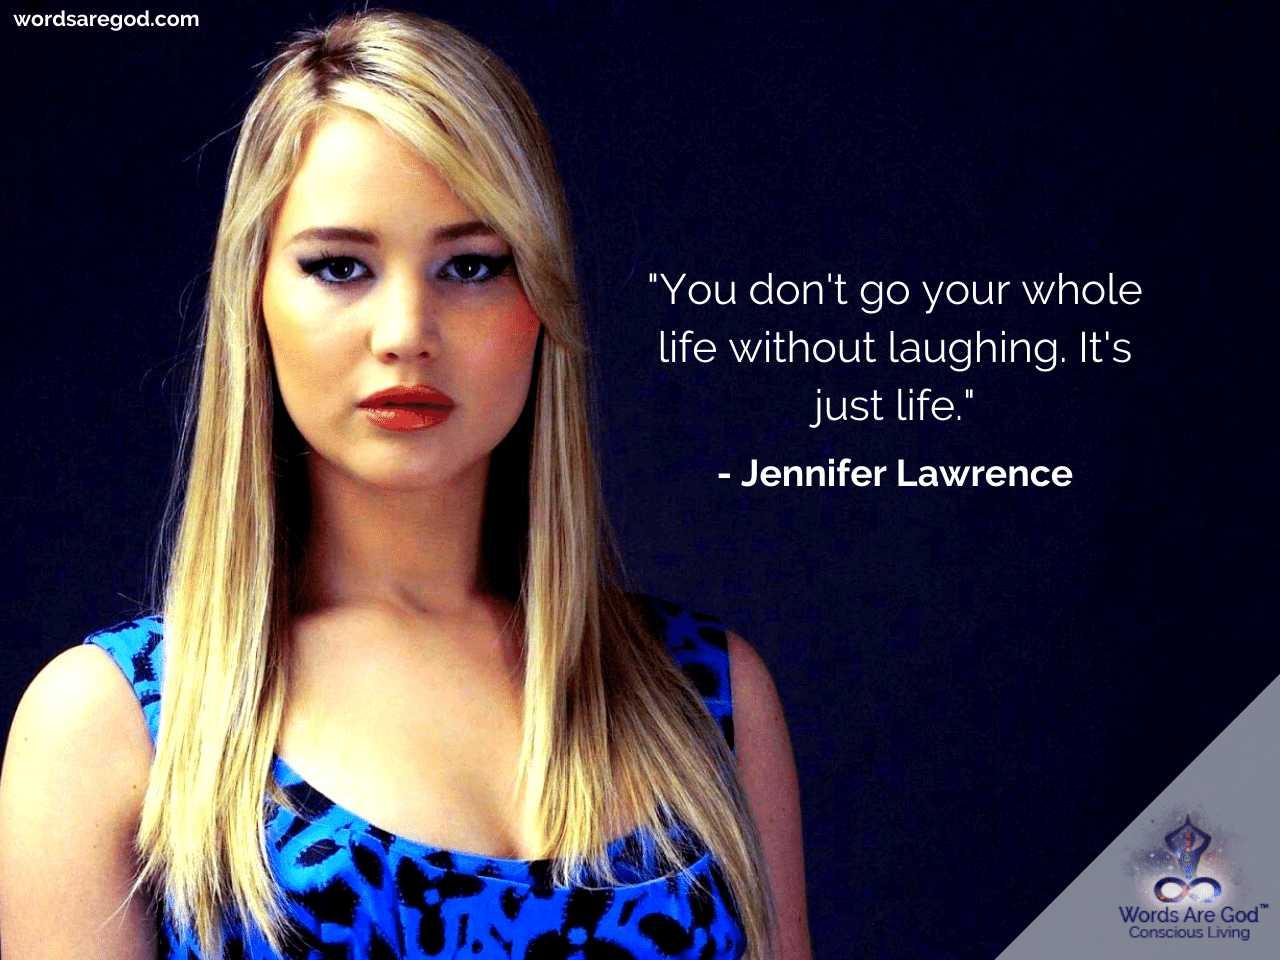 Jennifer Lawrence Motivational Quotes by Jennifer Lawrence